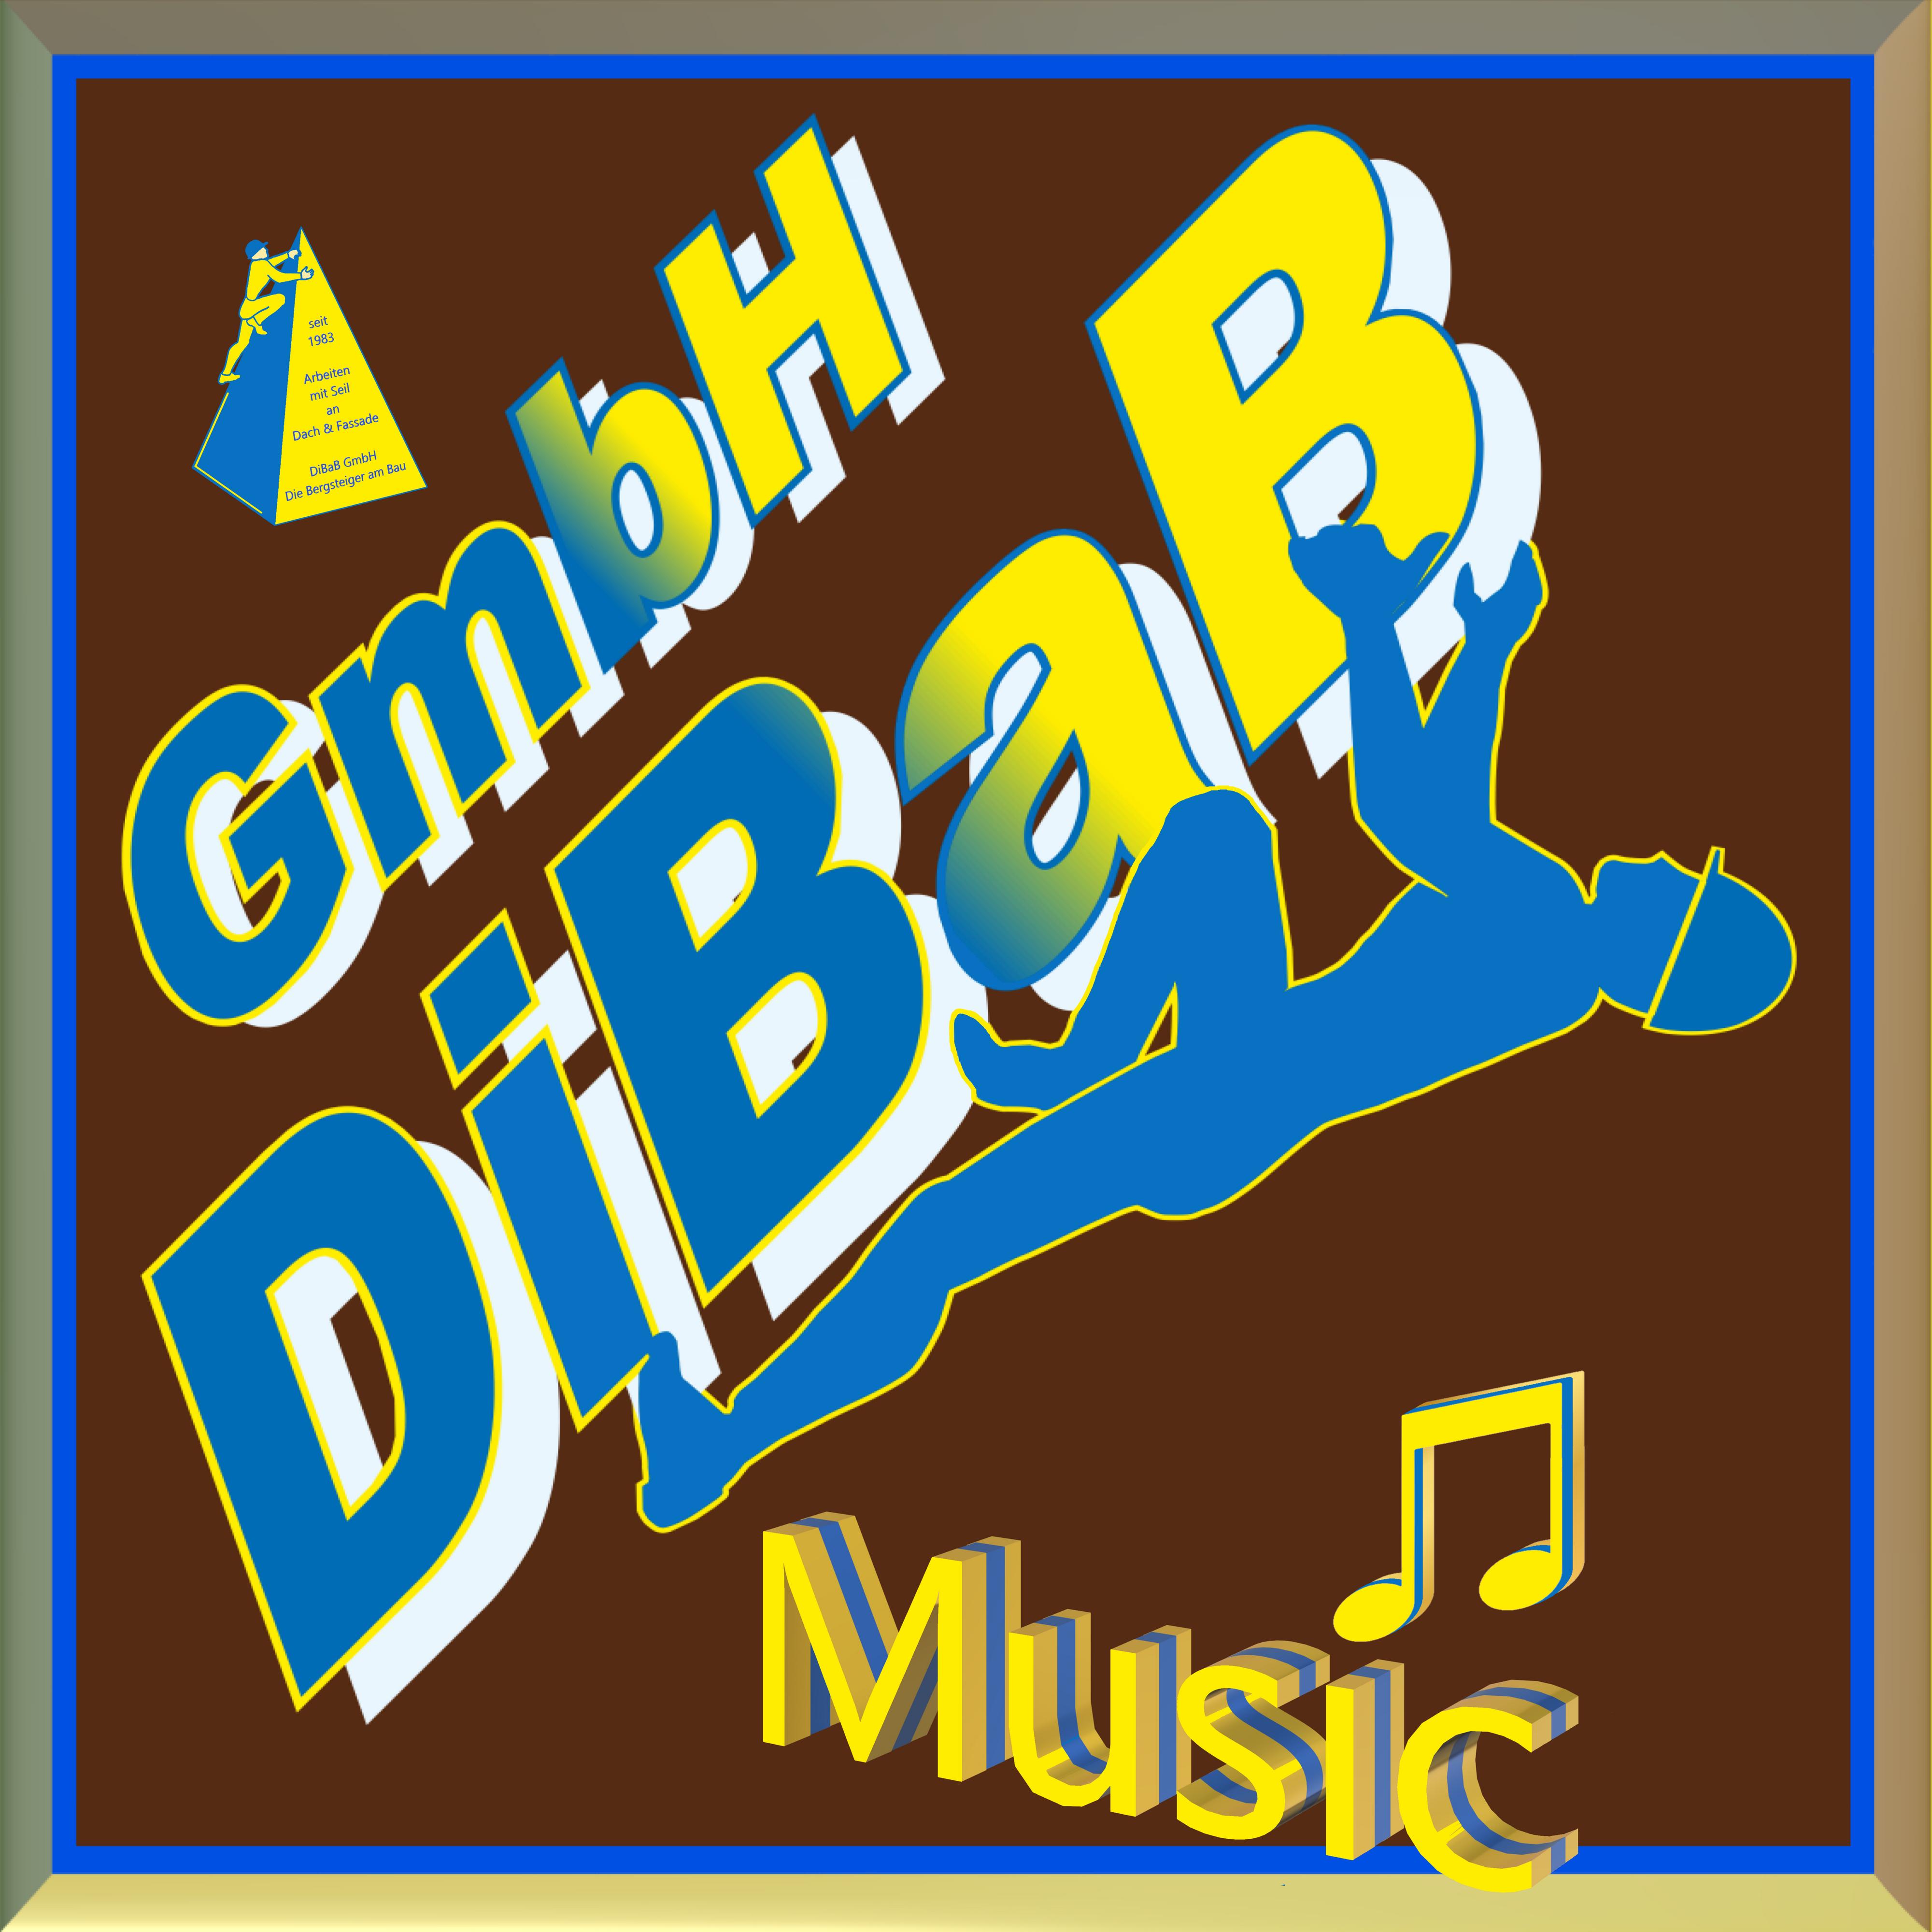 Notenverkauf, MP3 kostenlos, Playlists, DiBaB Music, André Hüller, Noten, Piano, Volksmusik, Country